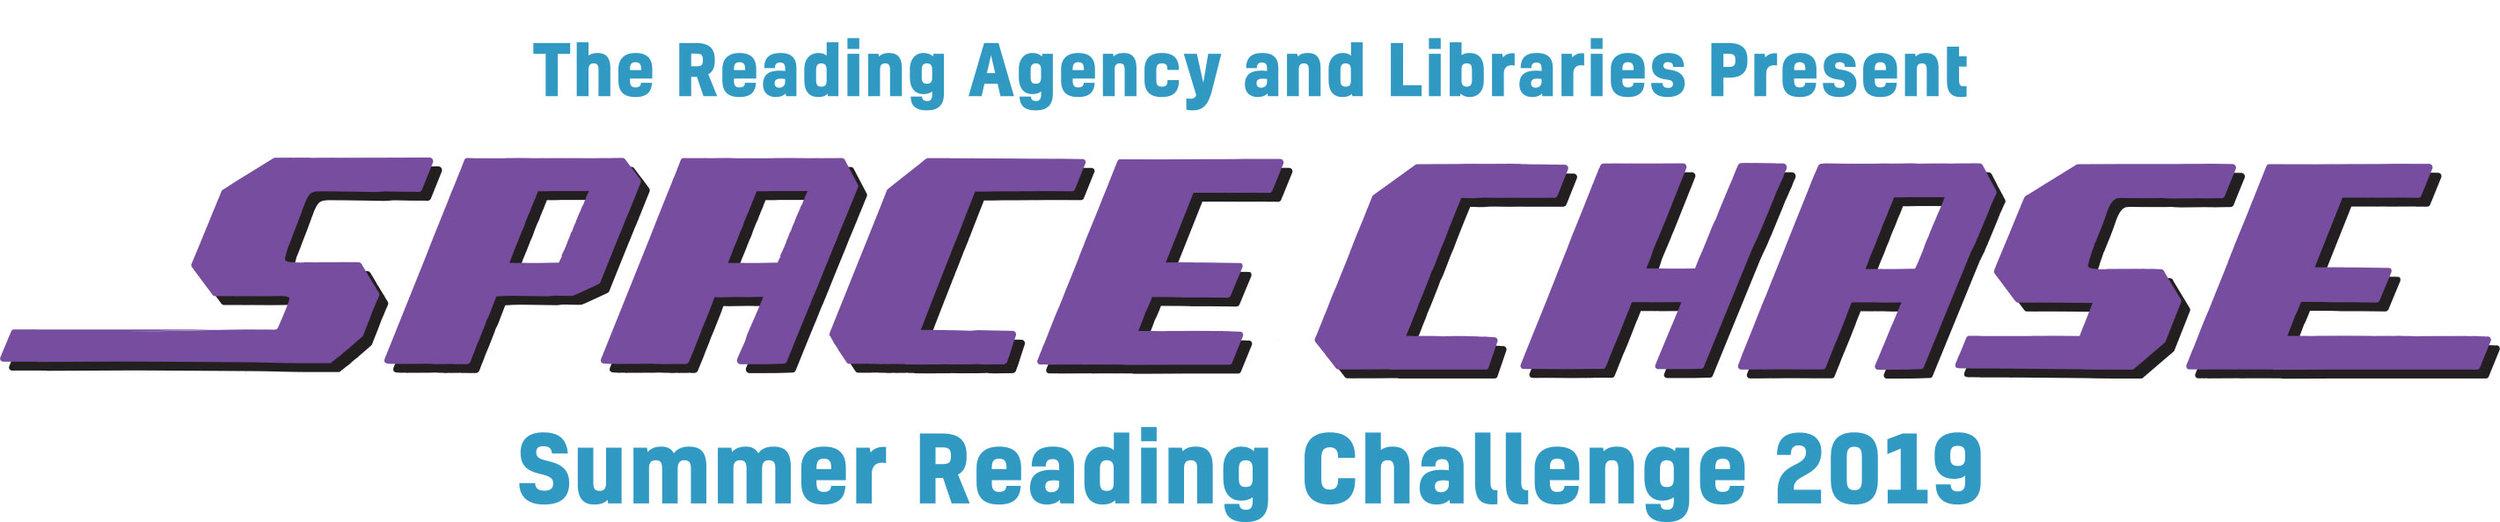 Space Chase landscape logo.jpg